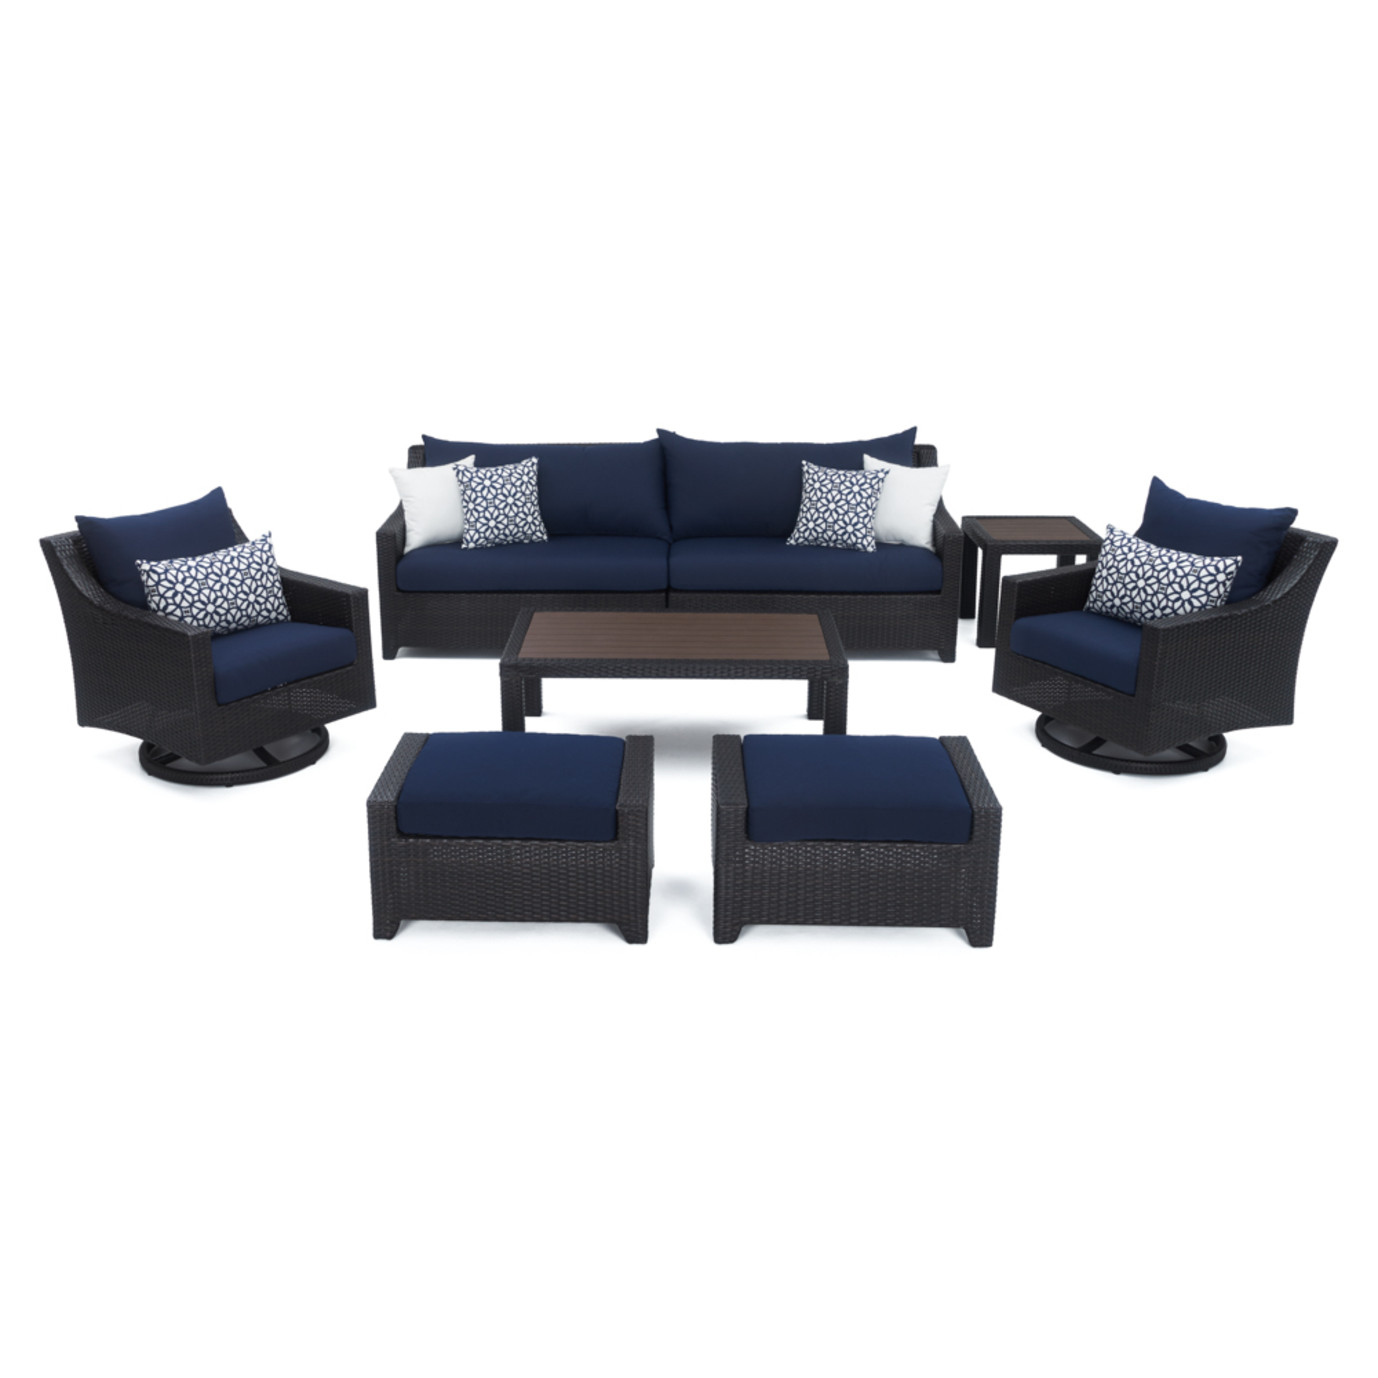 Deco™ Deluxe 8 Piece Sofa & Club Chair Set